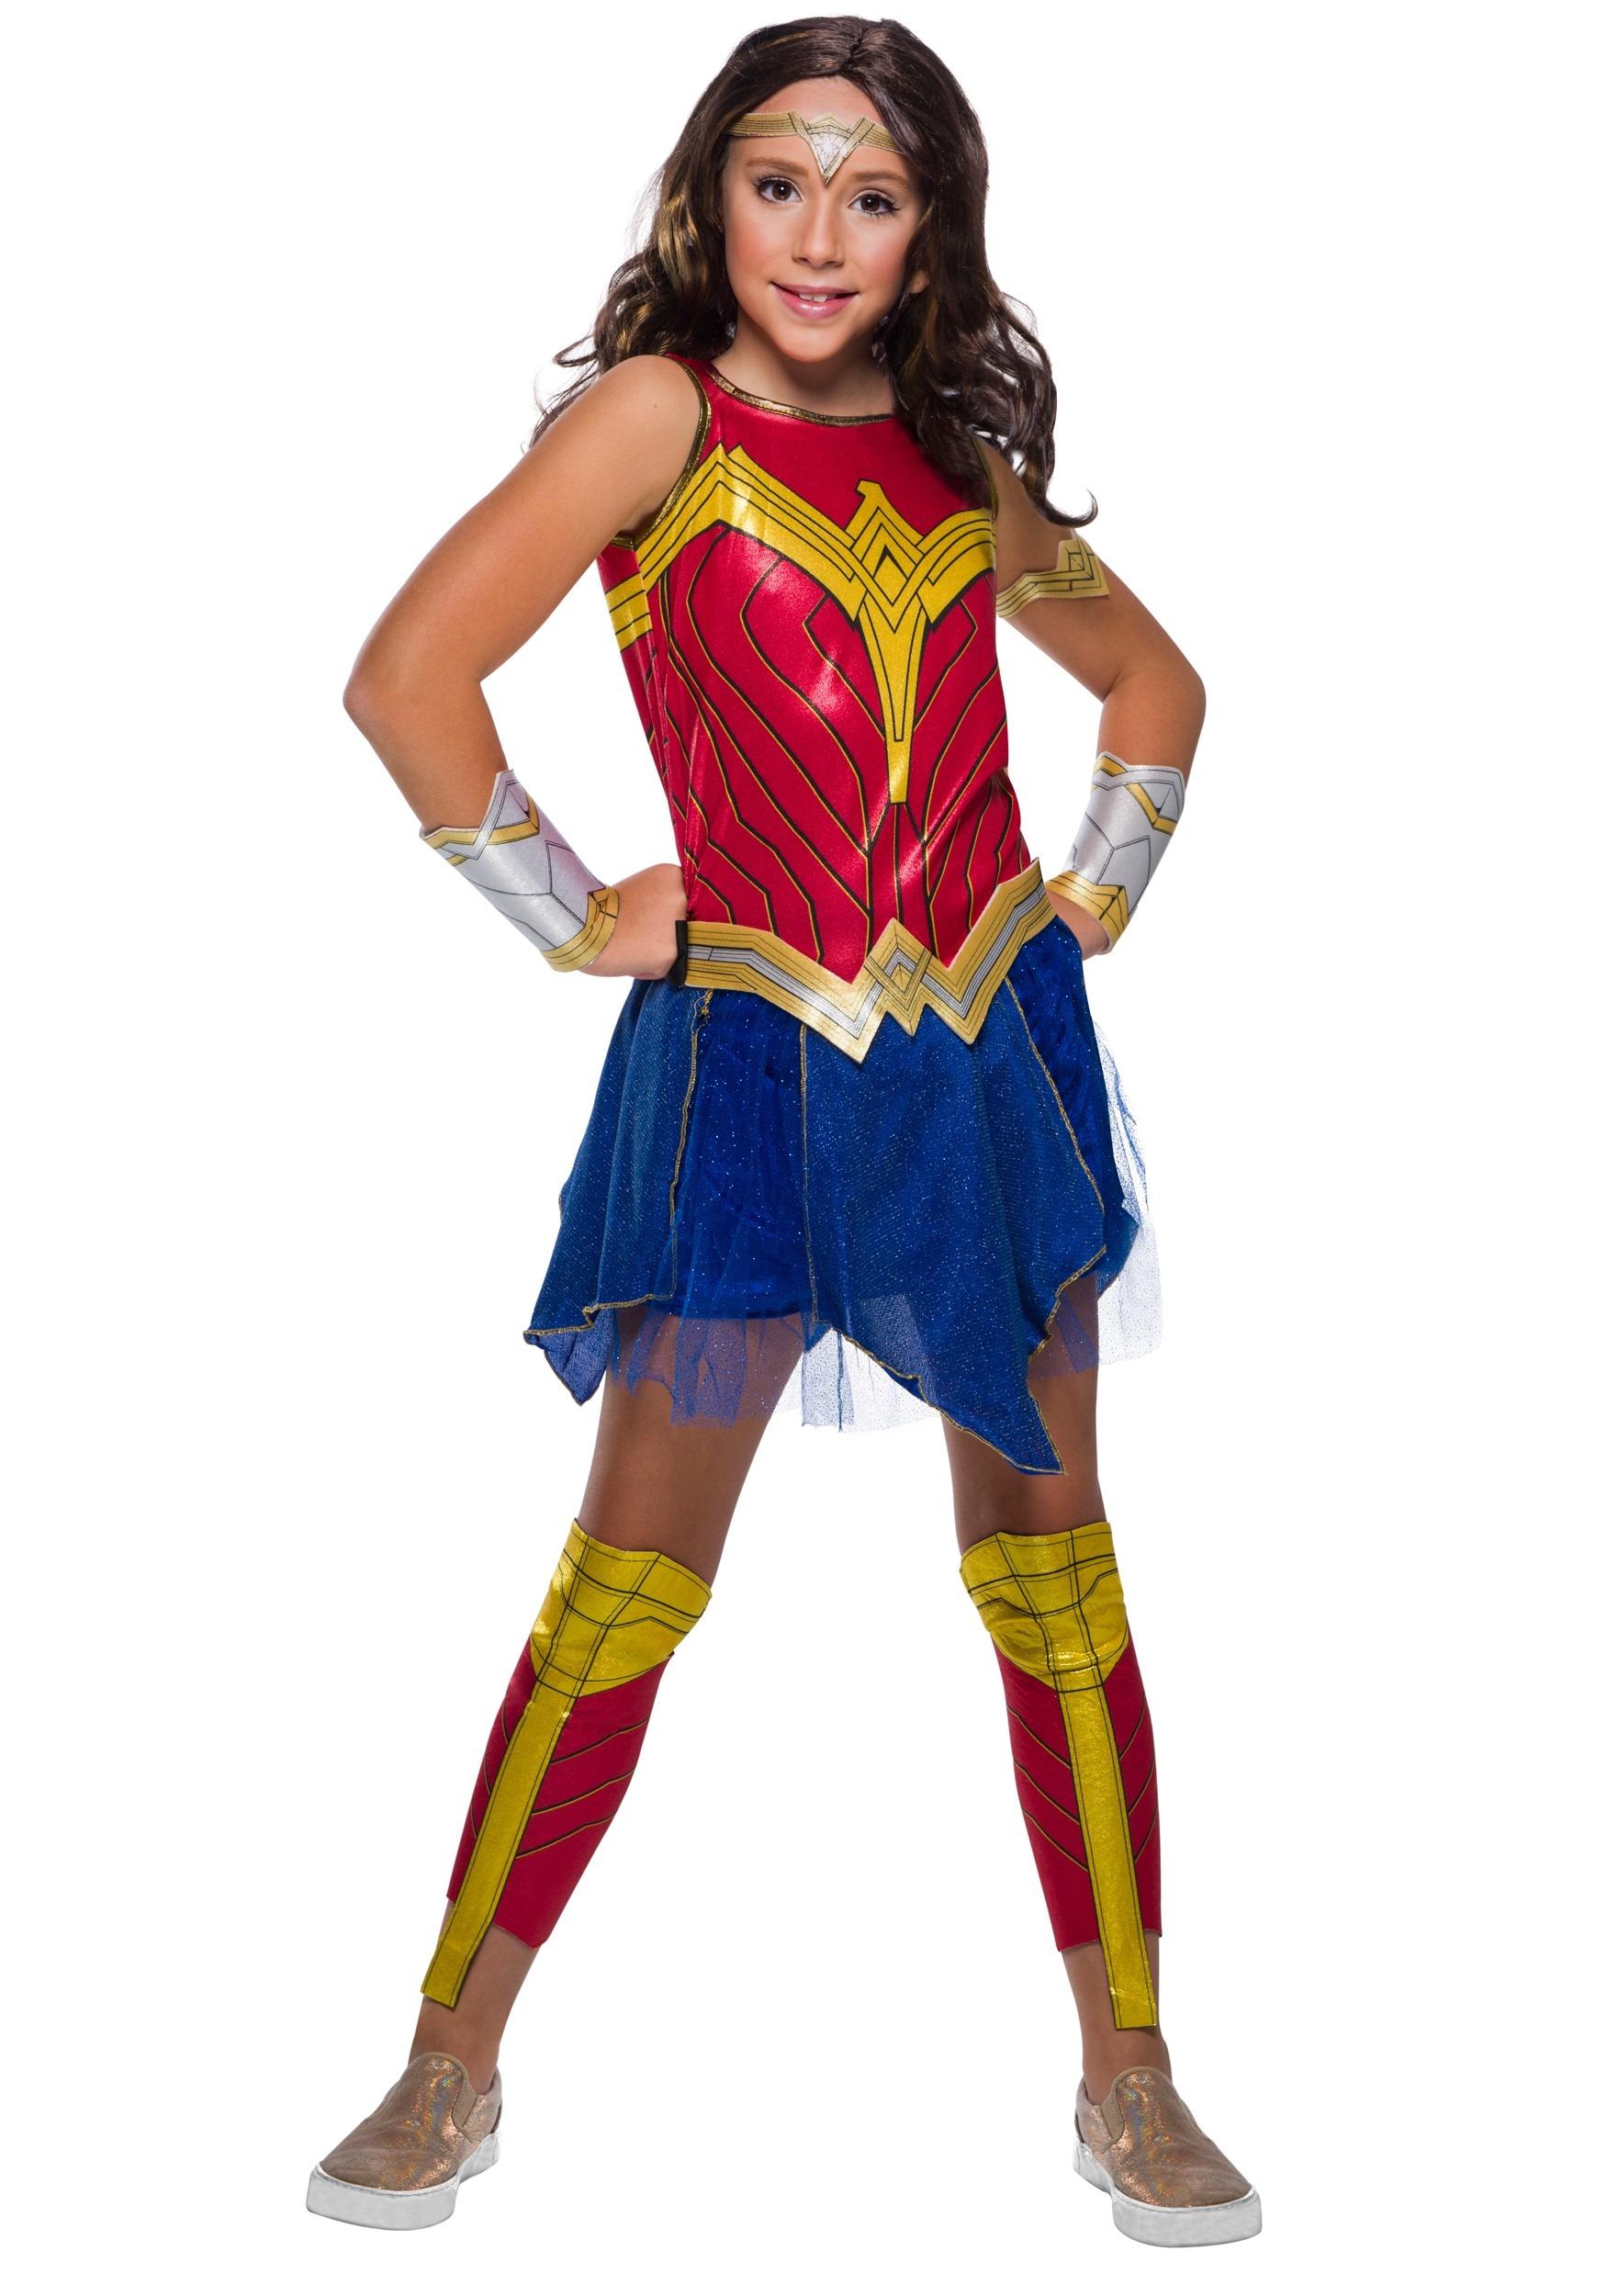 Girls Wonder Woman Deluxe Costume